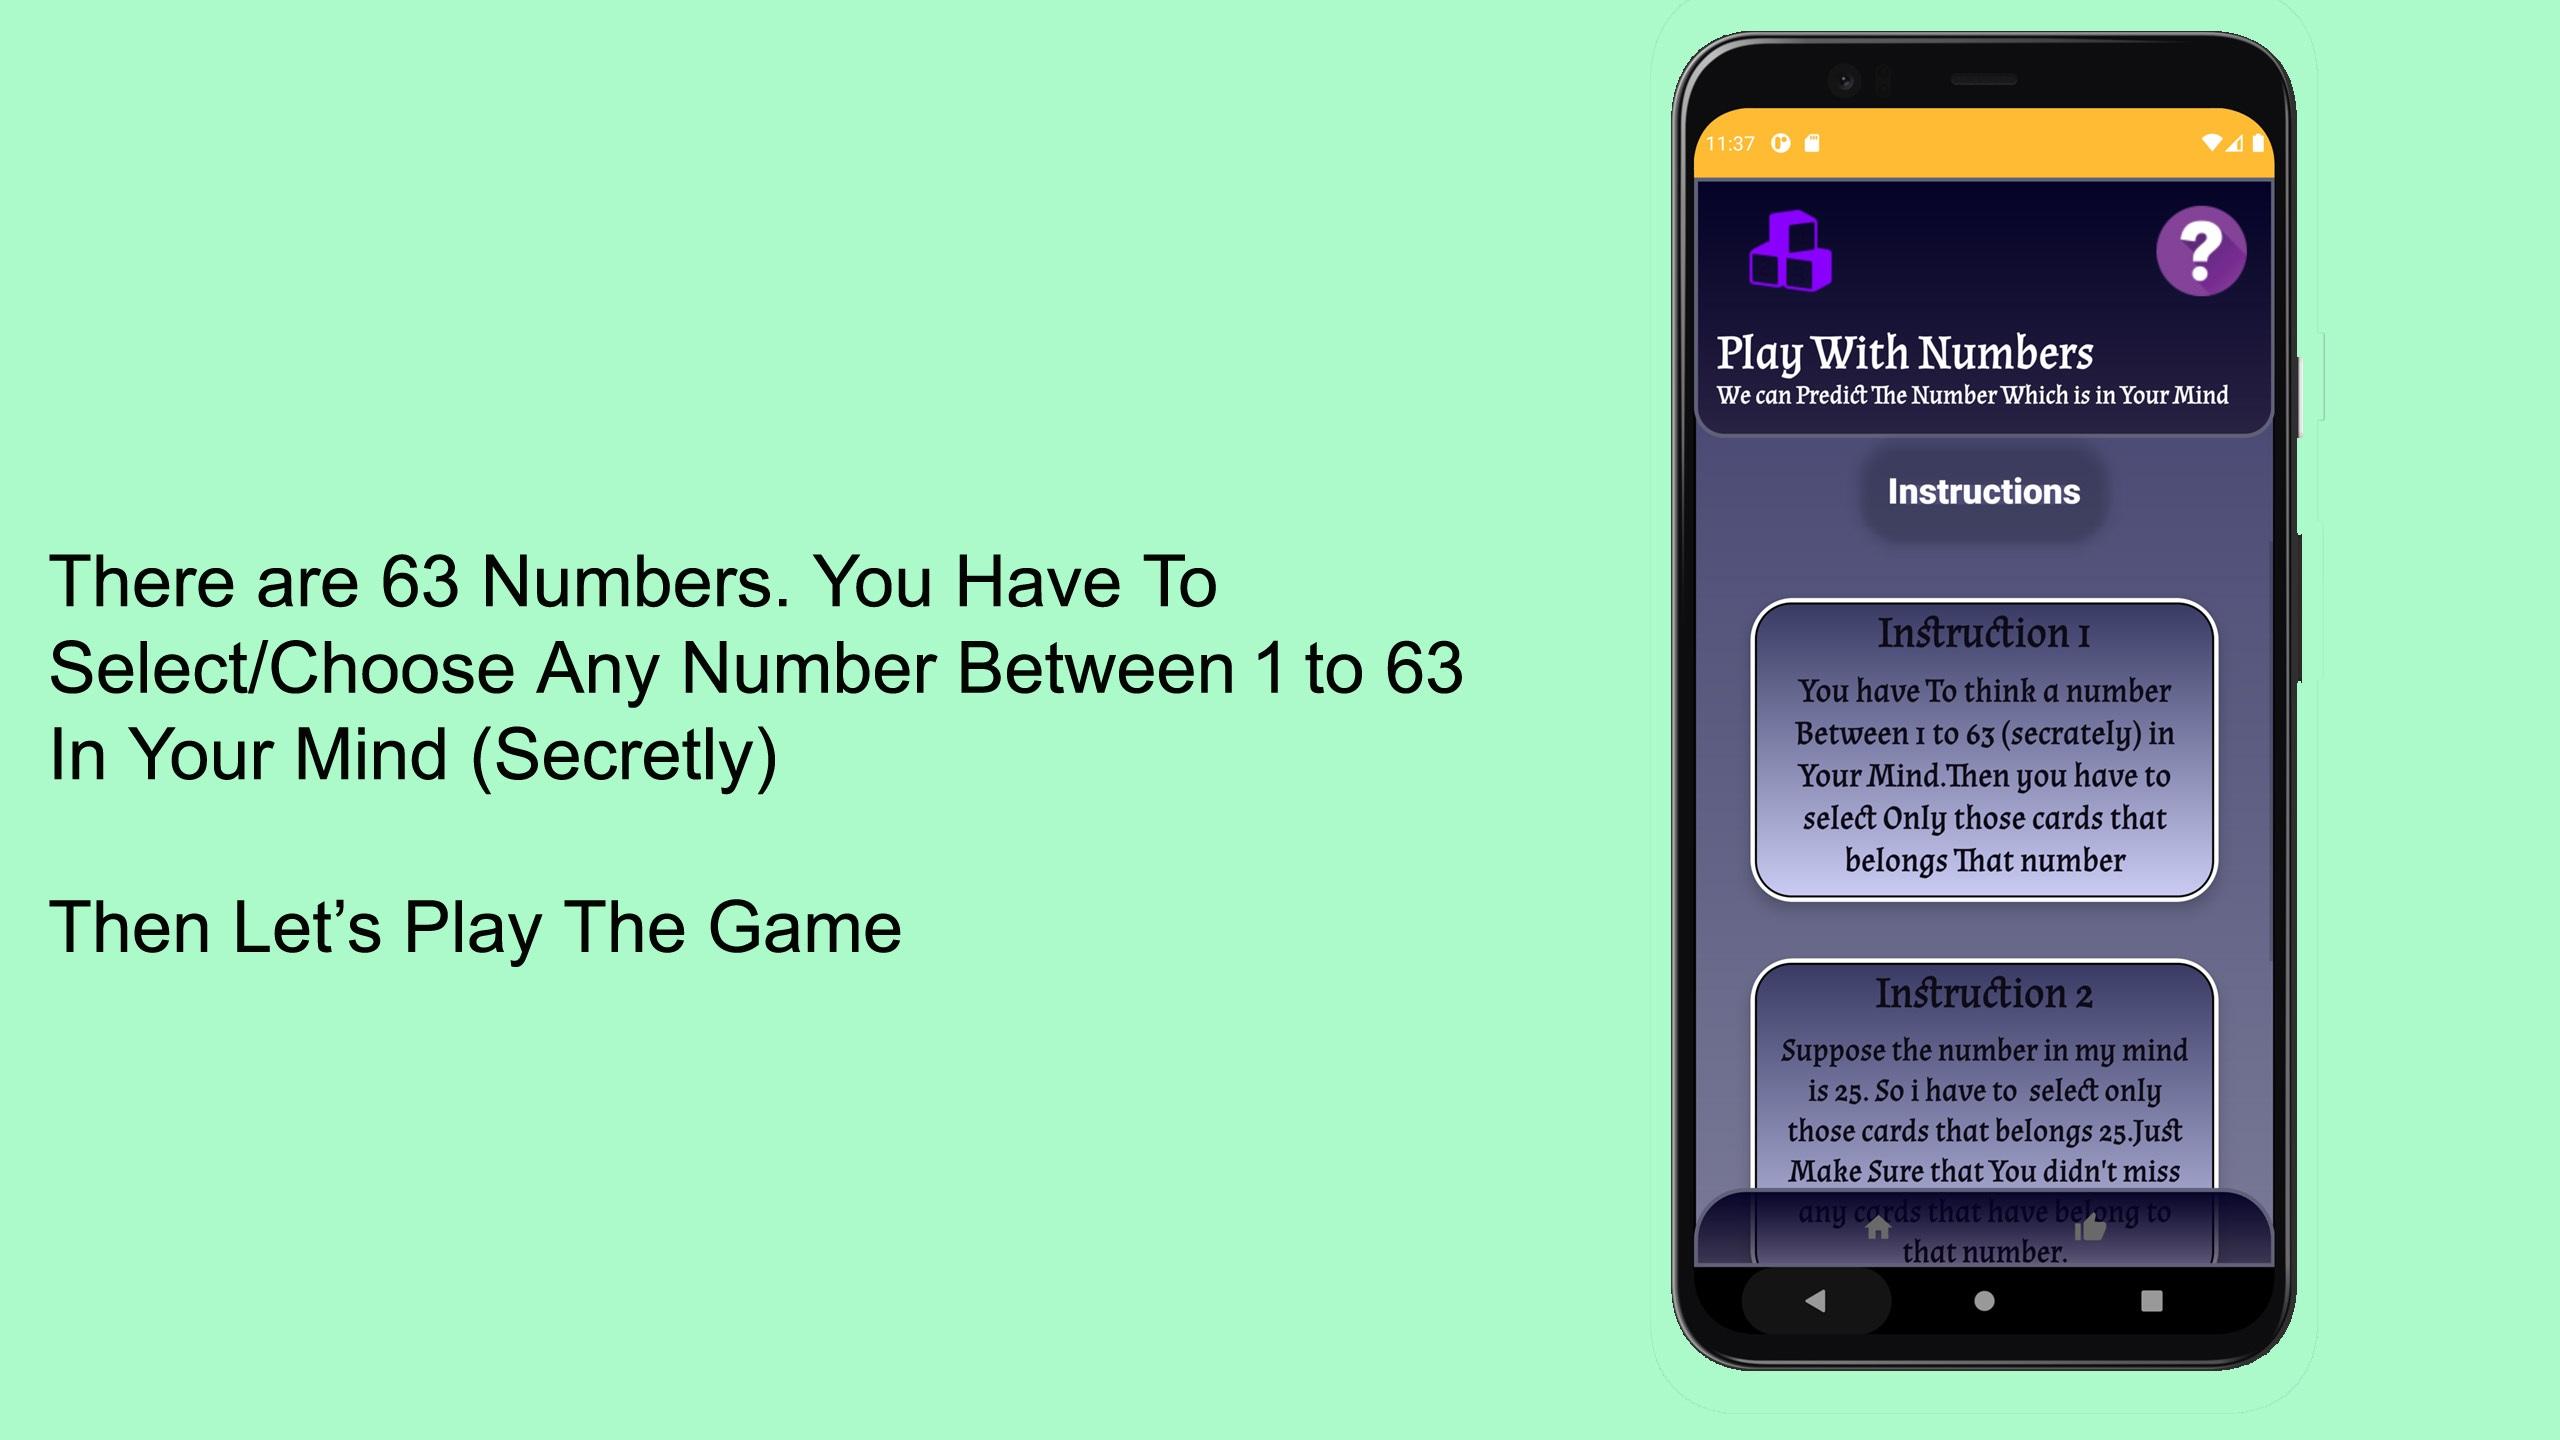 screenshot03.jpg?alt=media&token=18534cc